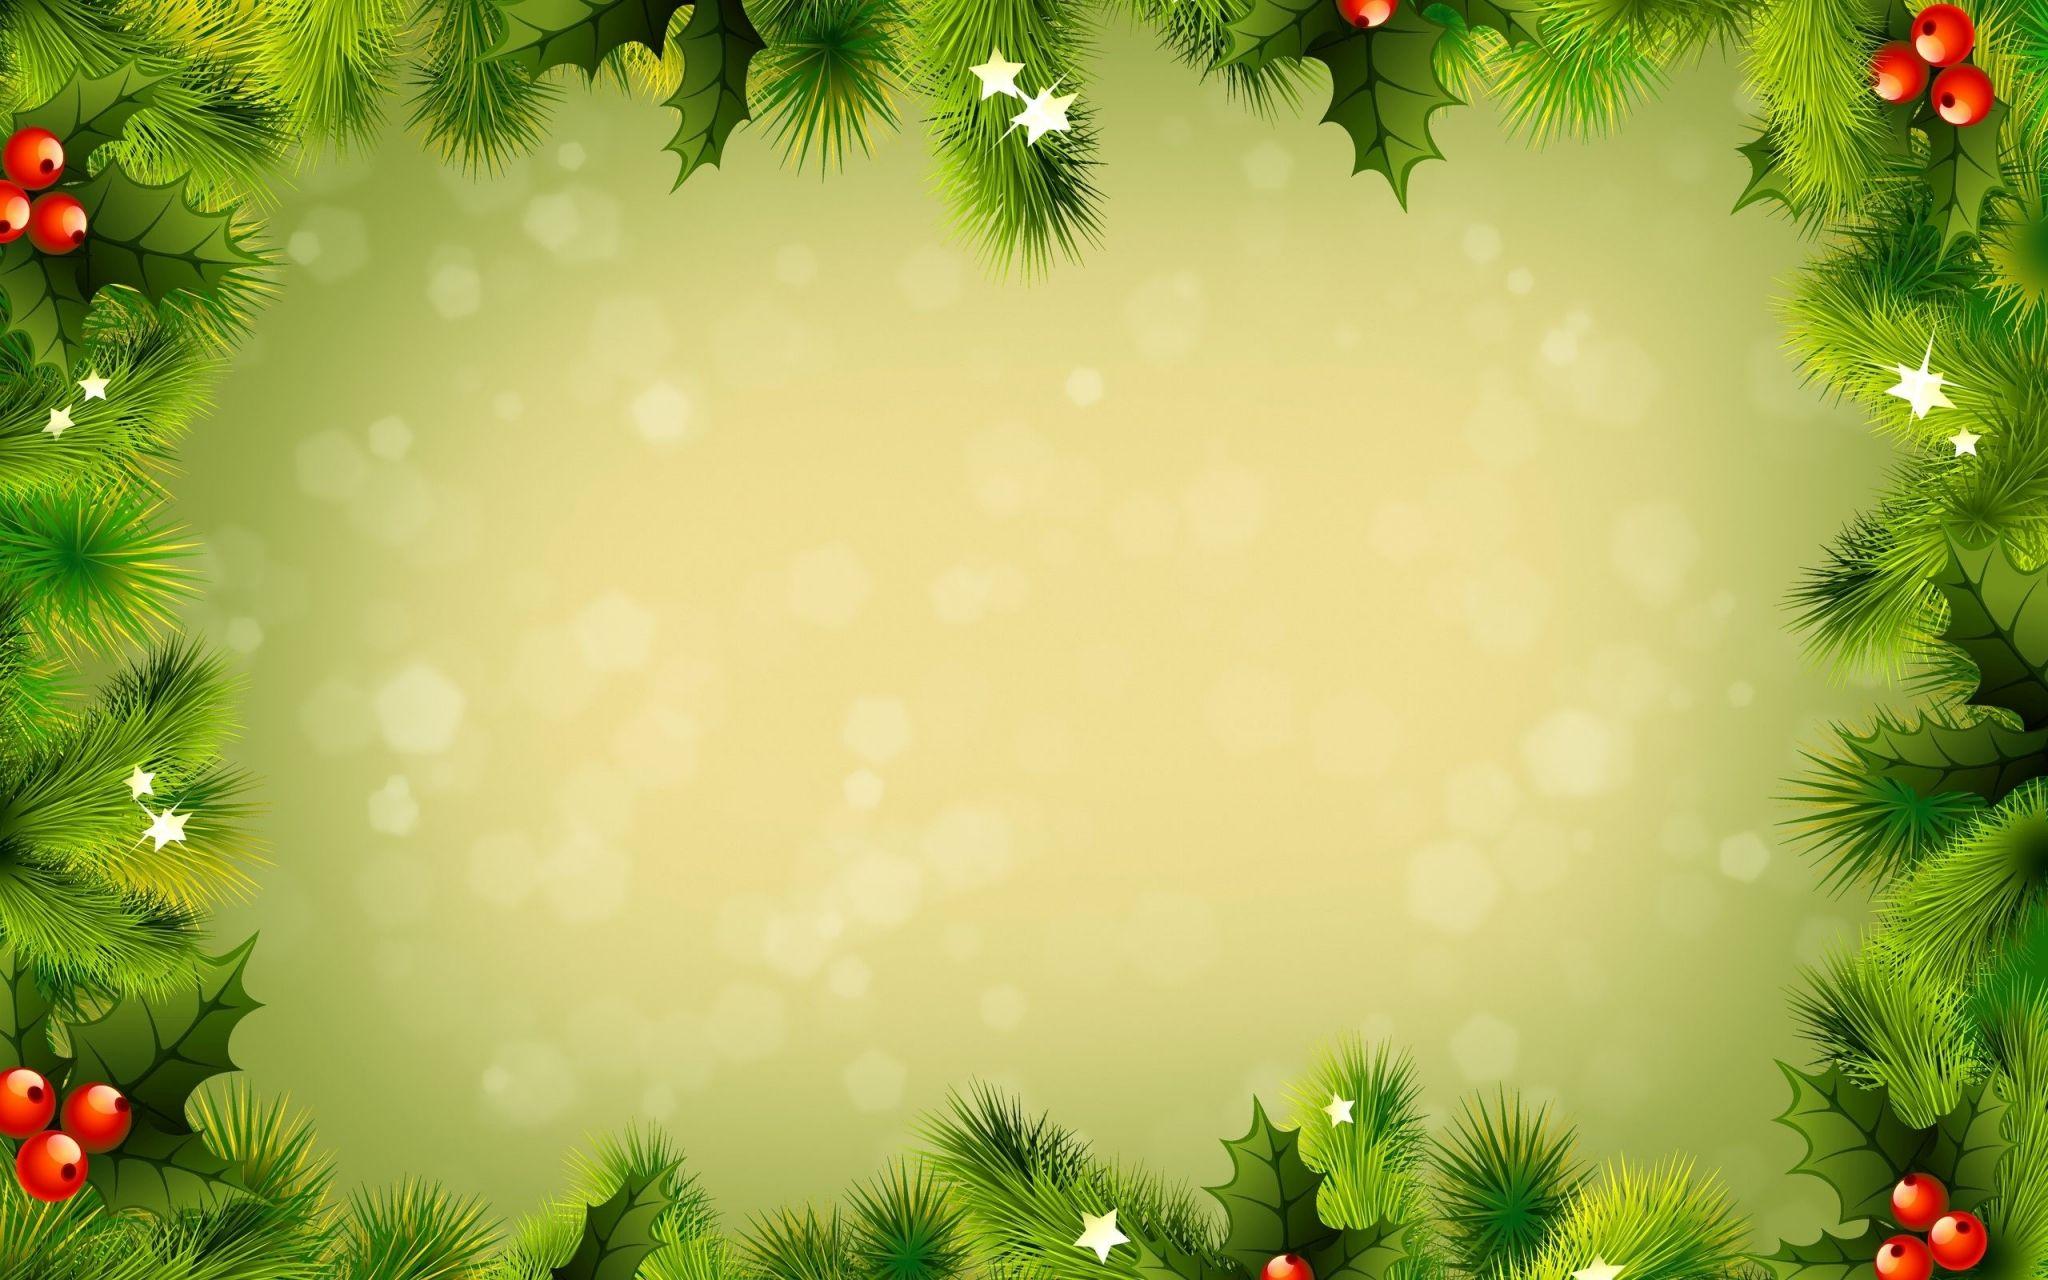 Free Holiday Desktop Backgrounds Christmas Wallpapers Free Free Christmas Wallpapers For Christmas Wallpaper Free Santa Claus Wallpaper Christmas Wallpaper